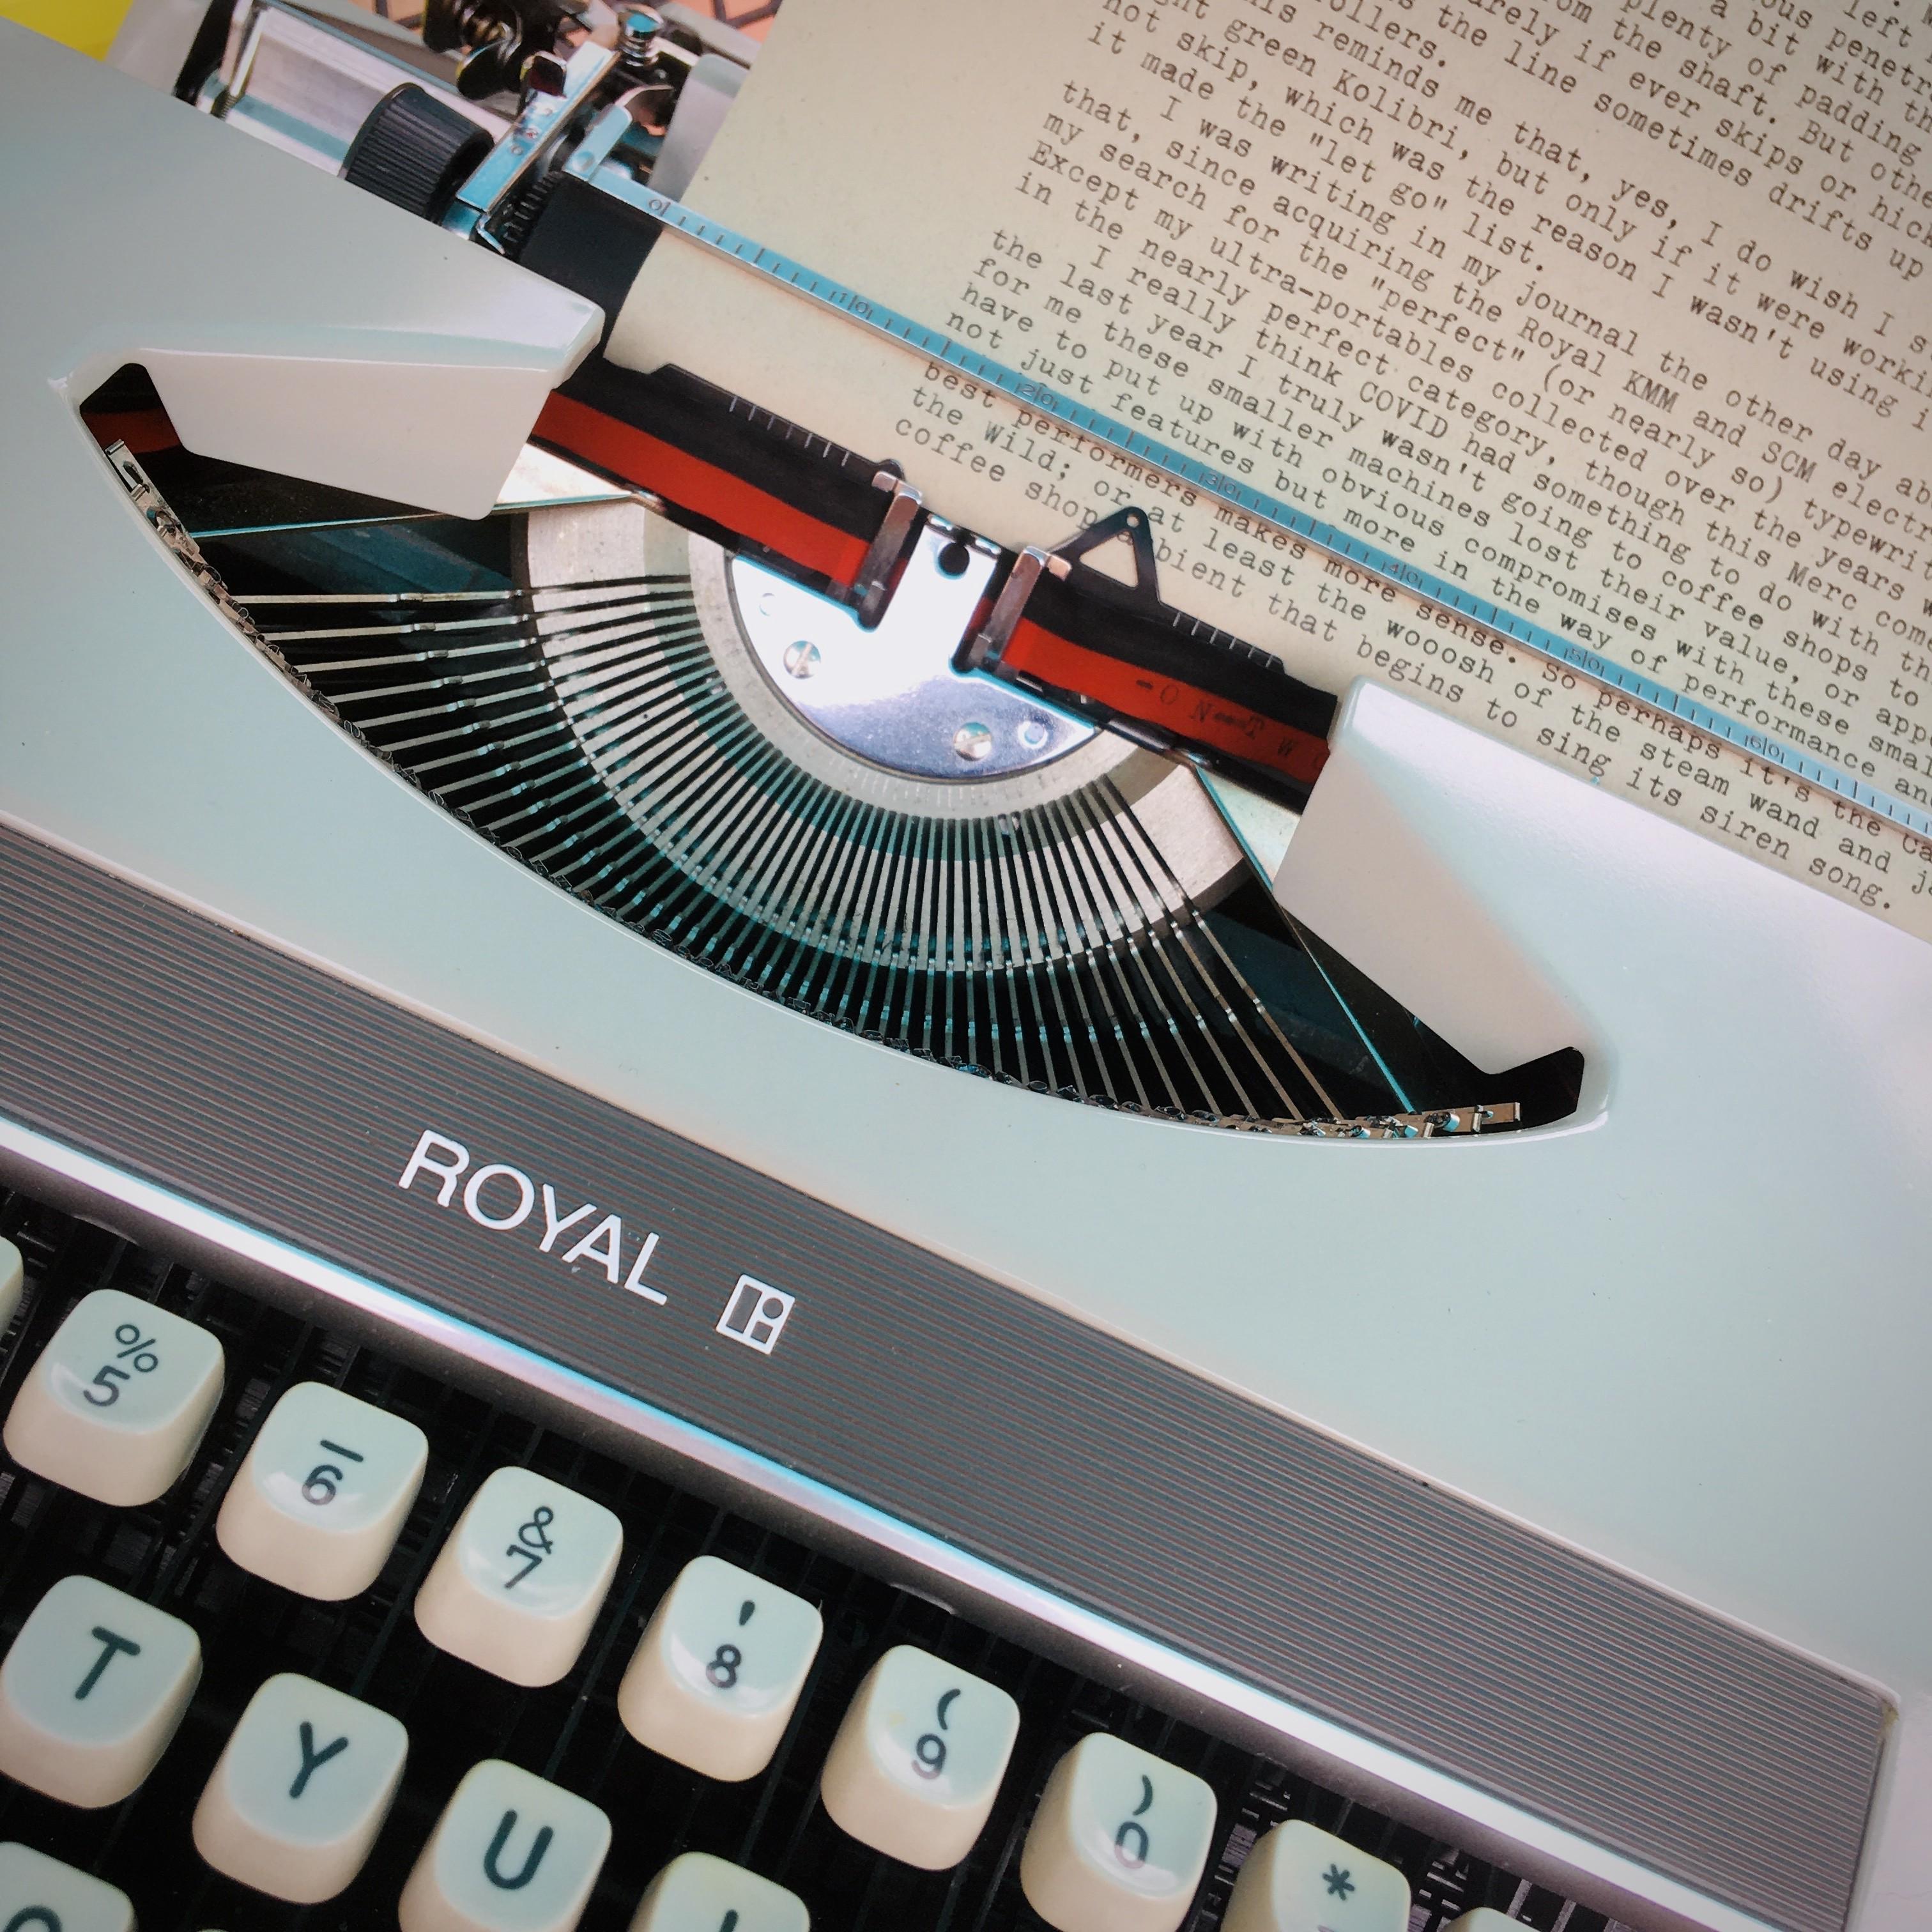 Royal Mercury & Astrobrights Kraft 24# Paper